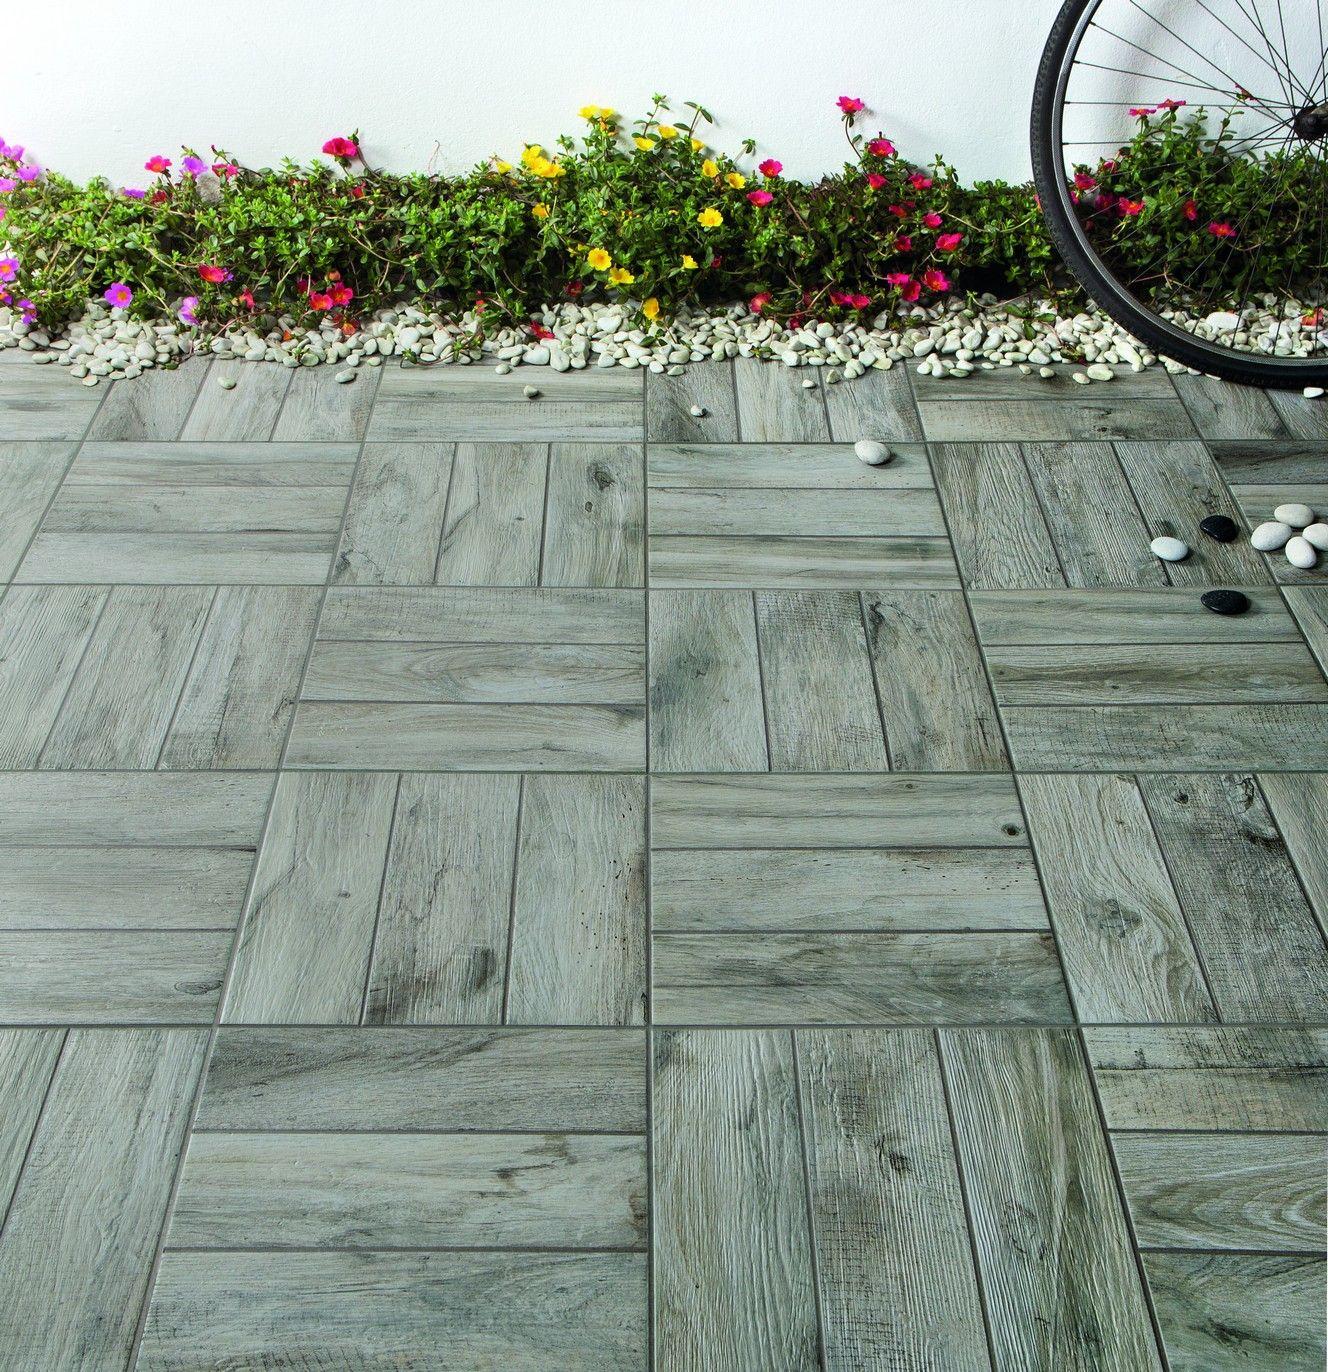 Pavimento esterno piana grigio 34x34x0 9 cm pei 5 r11 gres - Pavimento esterno ikea ...